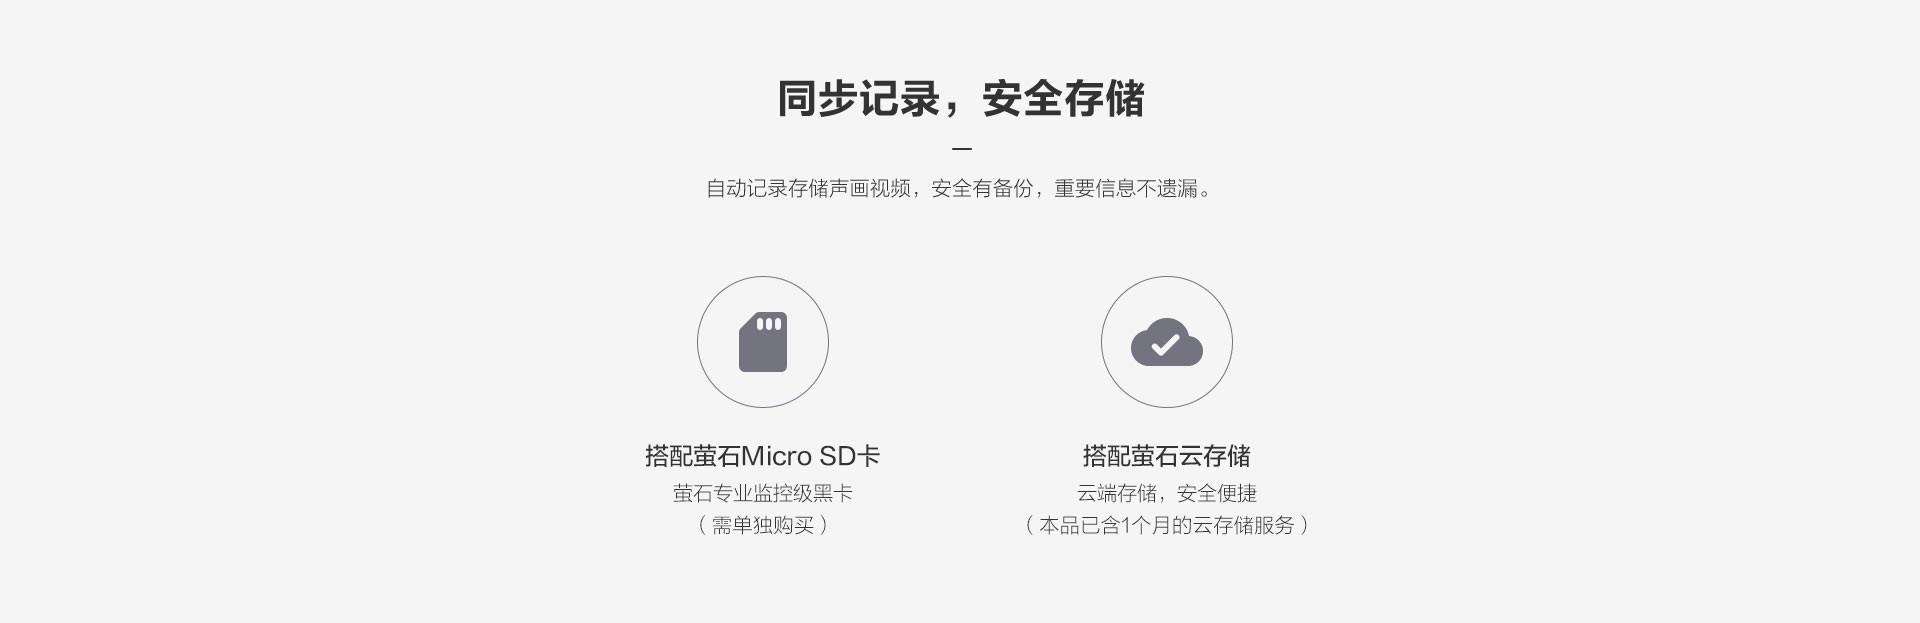 C8C+SD1套装web_25.jpg